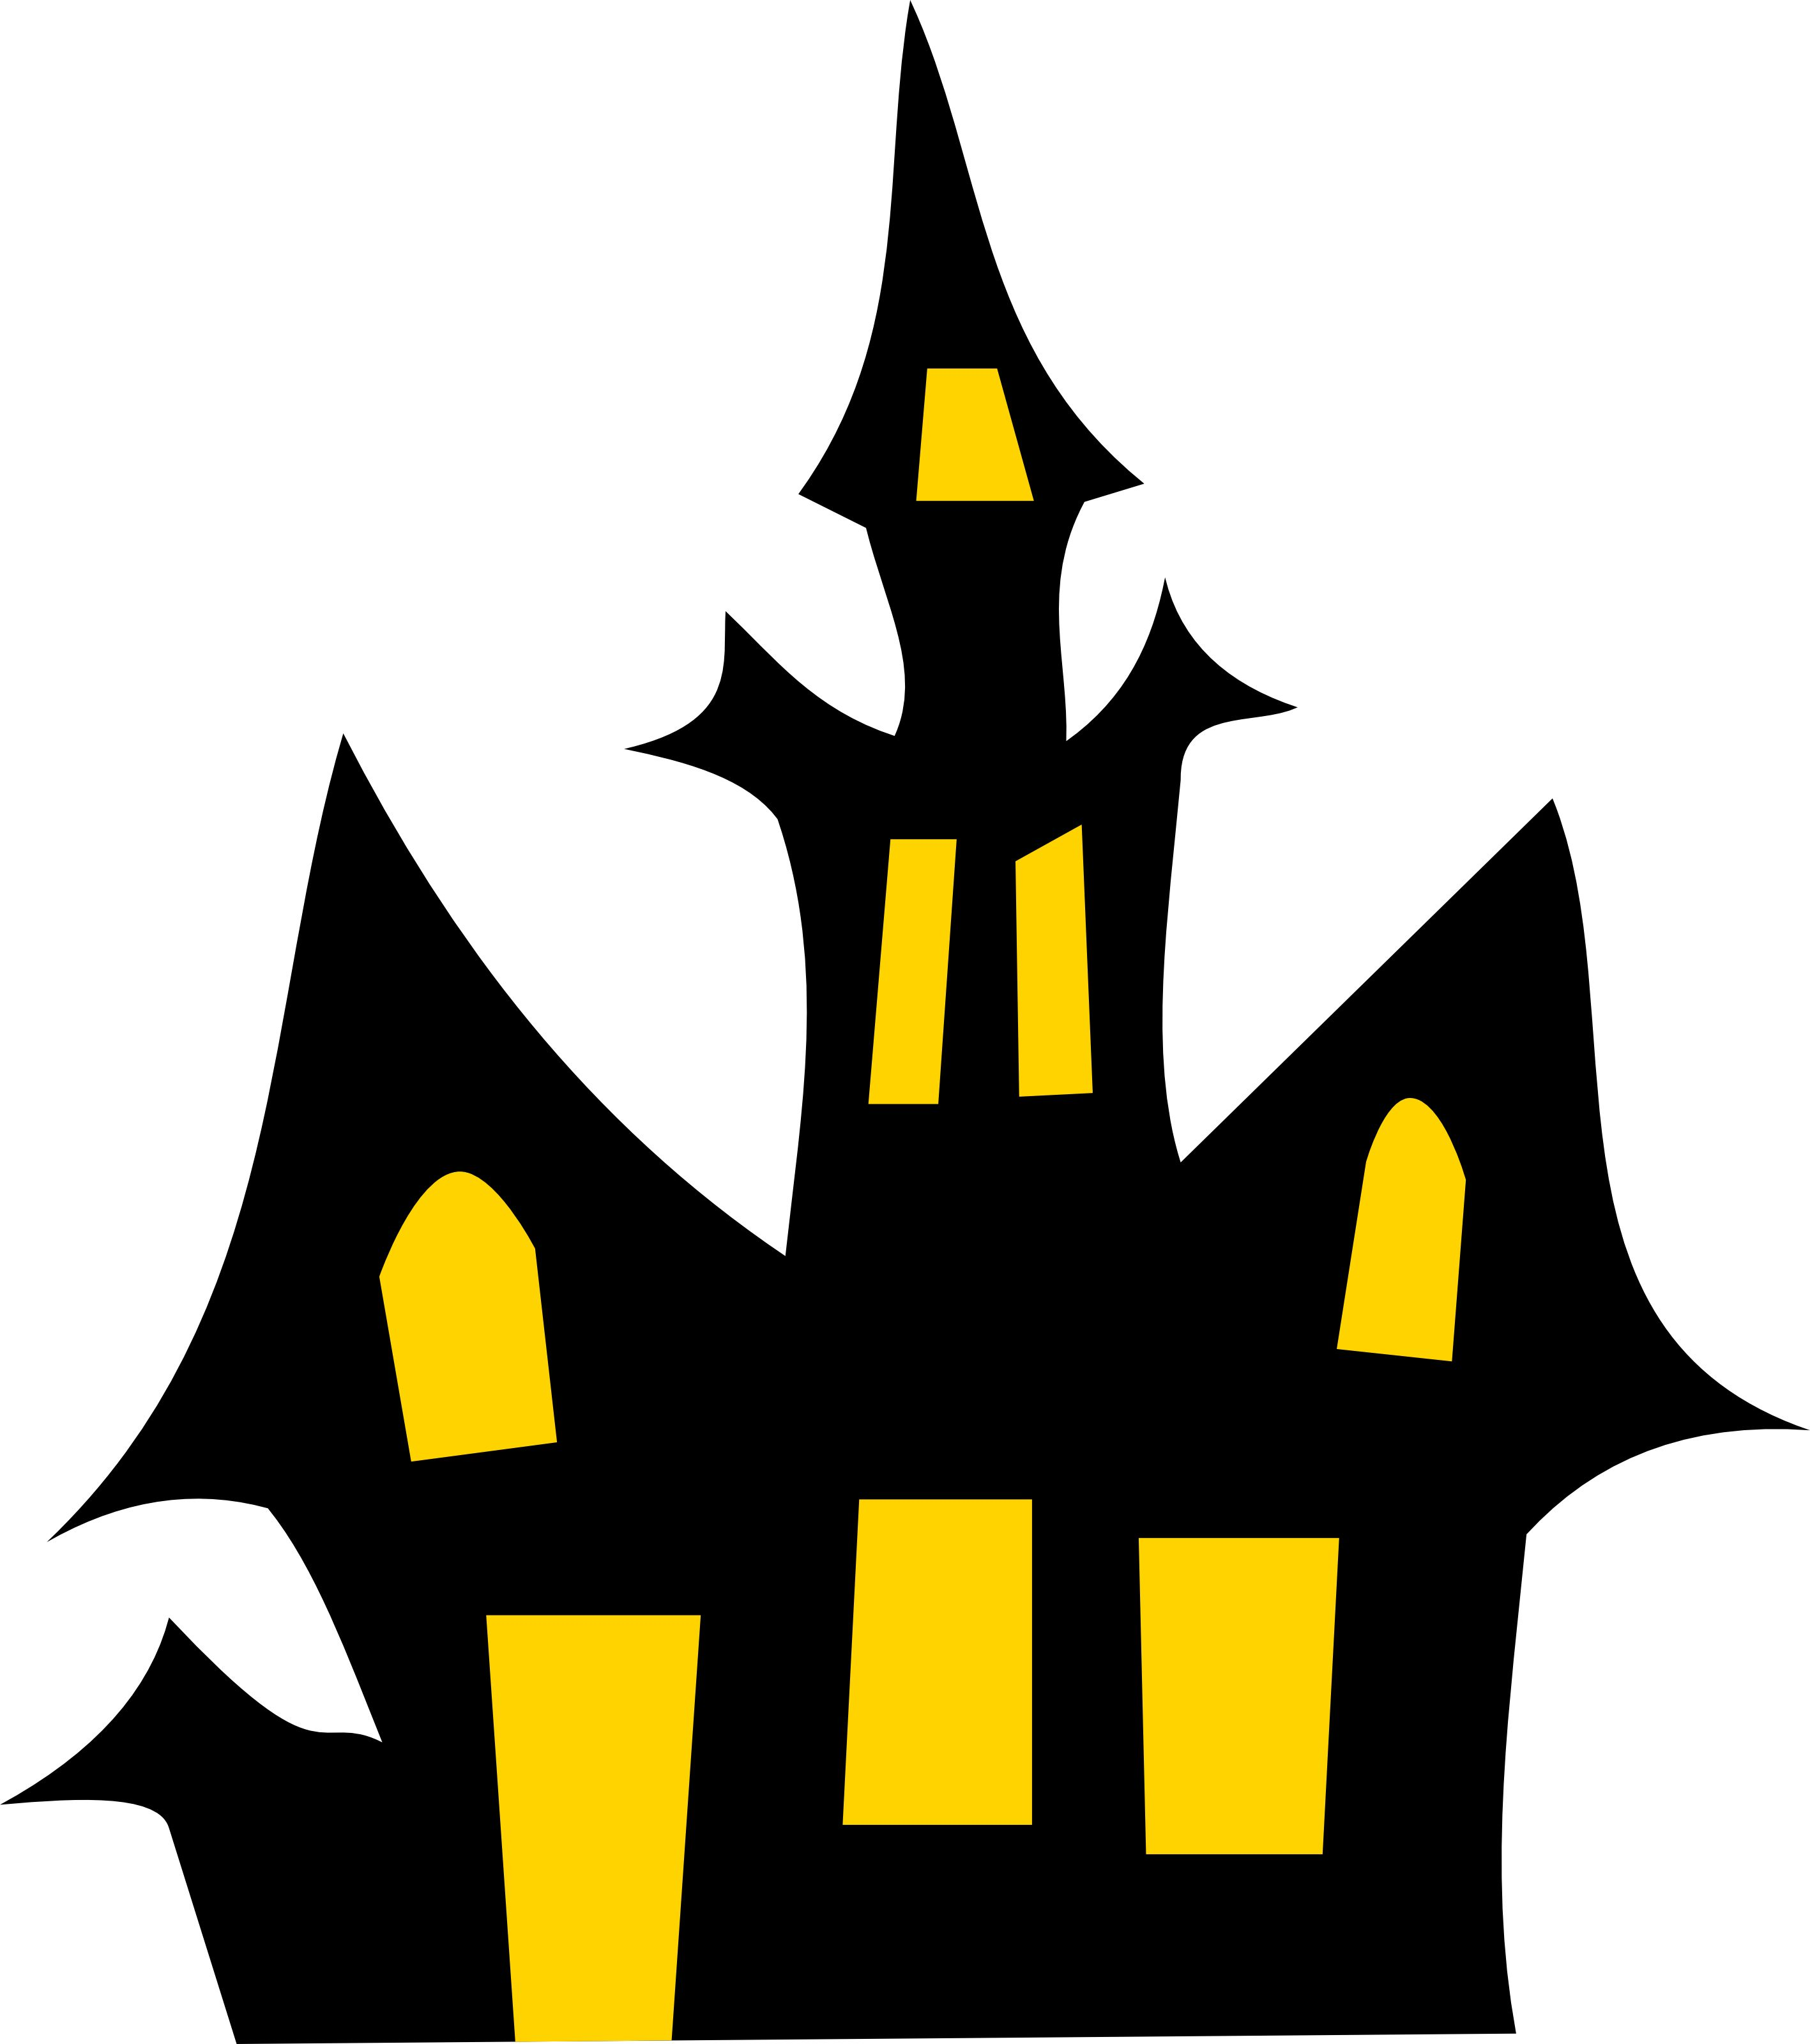 medium resolution of free haunted house halloween vector clipart illustration